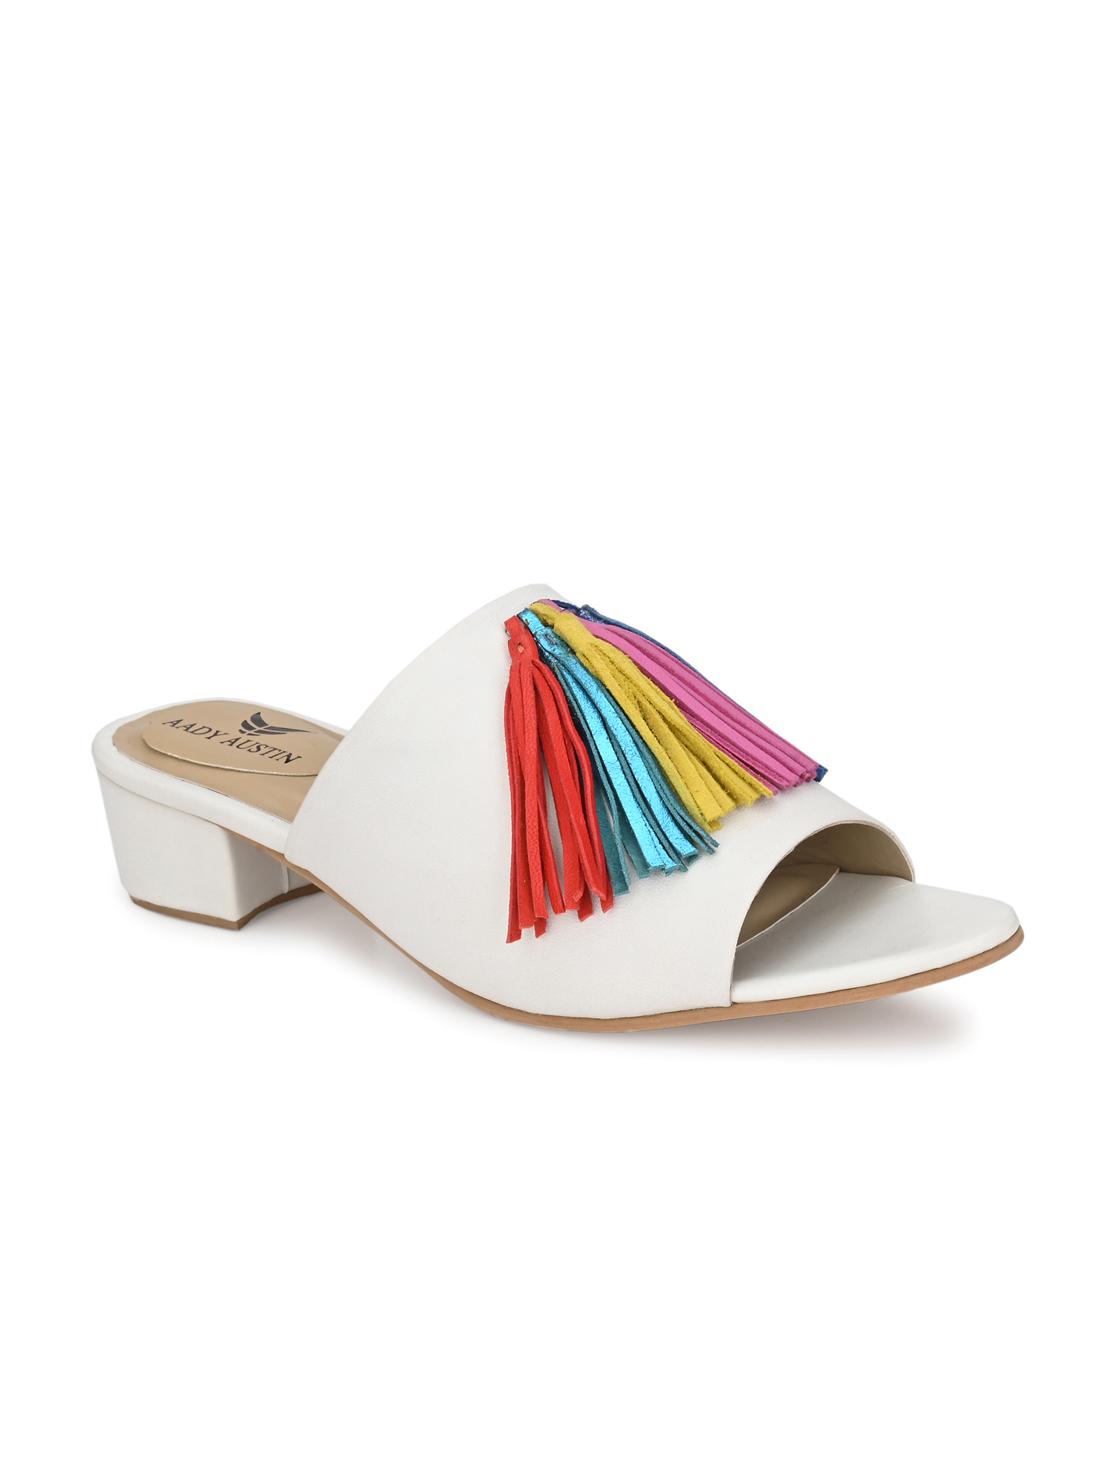 AADY AUSTIN | Aady Austin Women's Trendy White Pointed Toe Block Heel